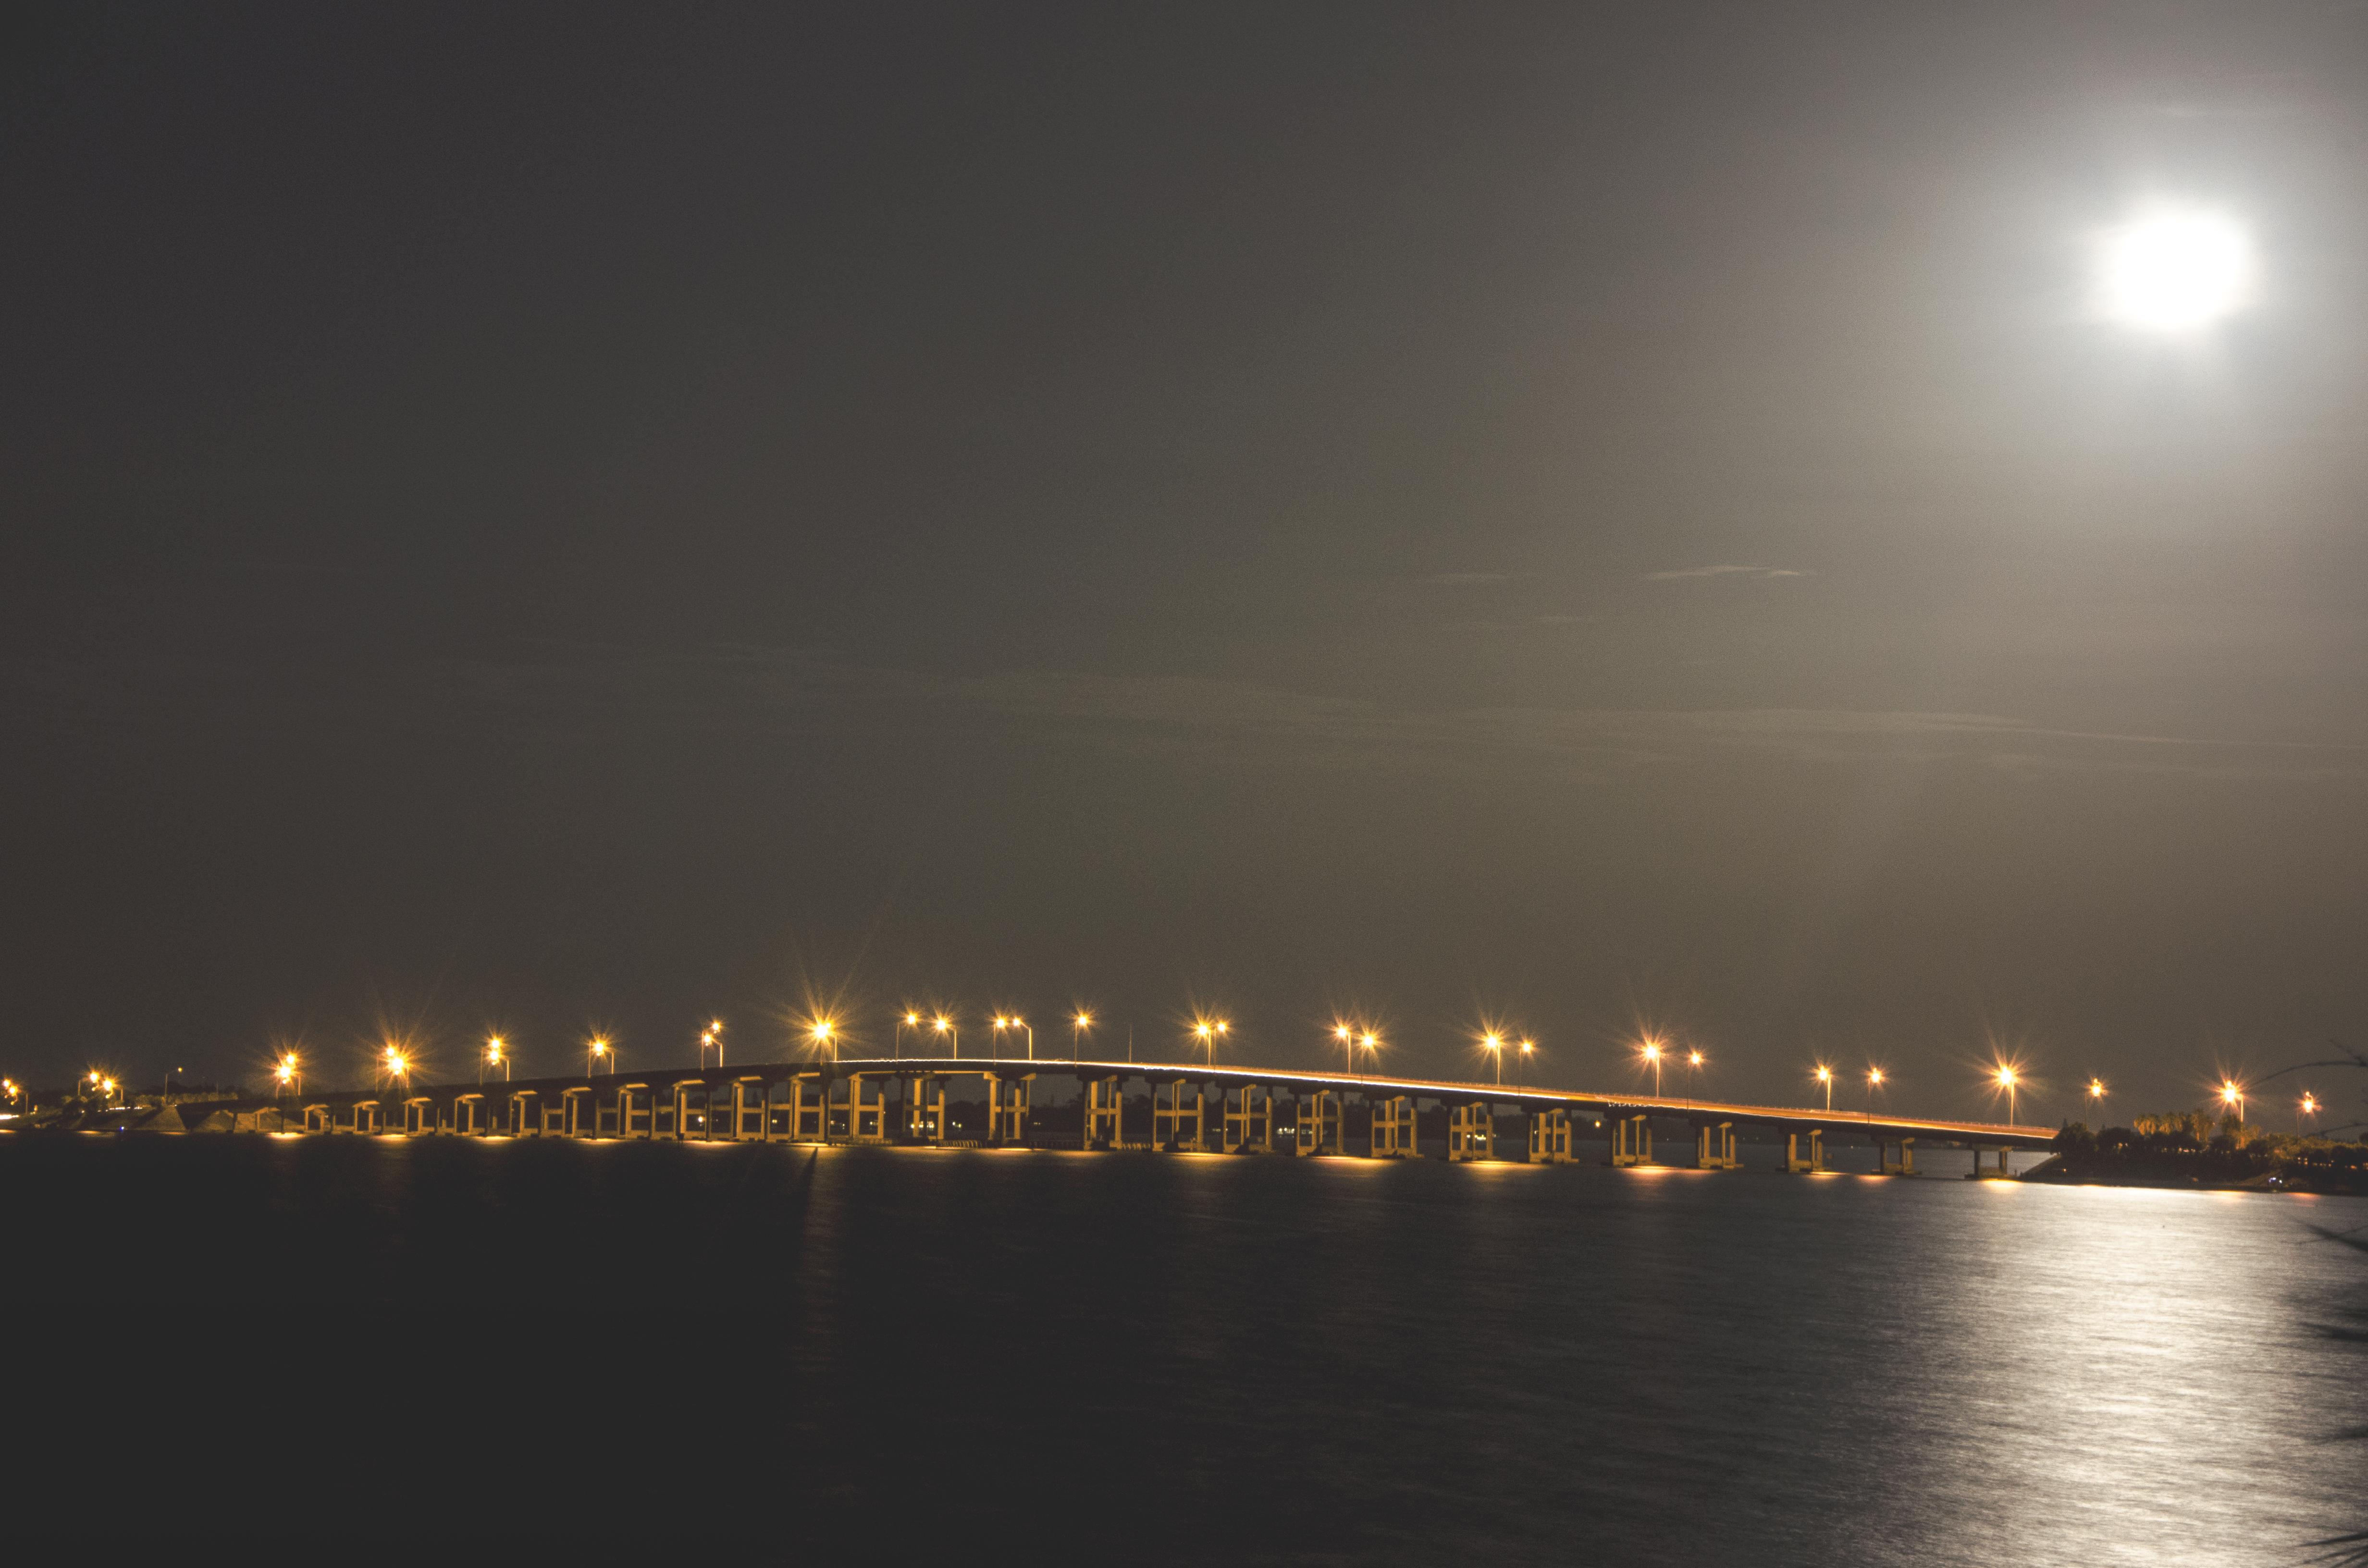 Bridge Over Water at Night, Bridge, Lights, Moon, Night, HQ Photo